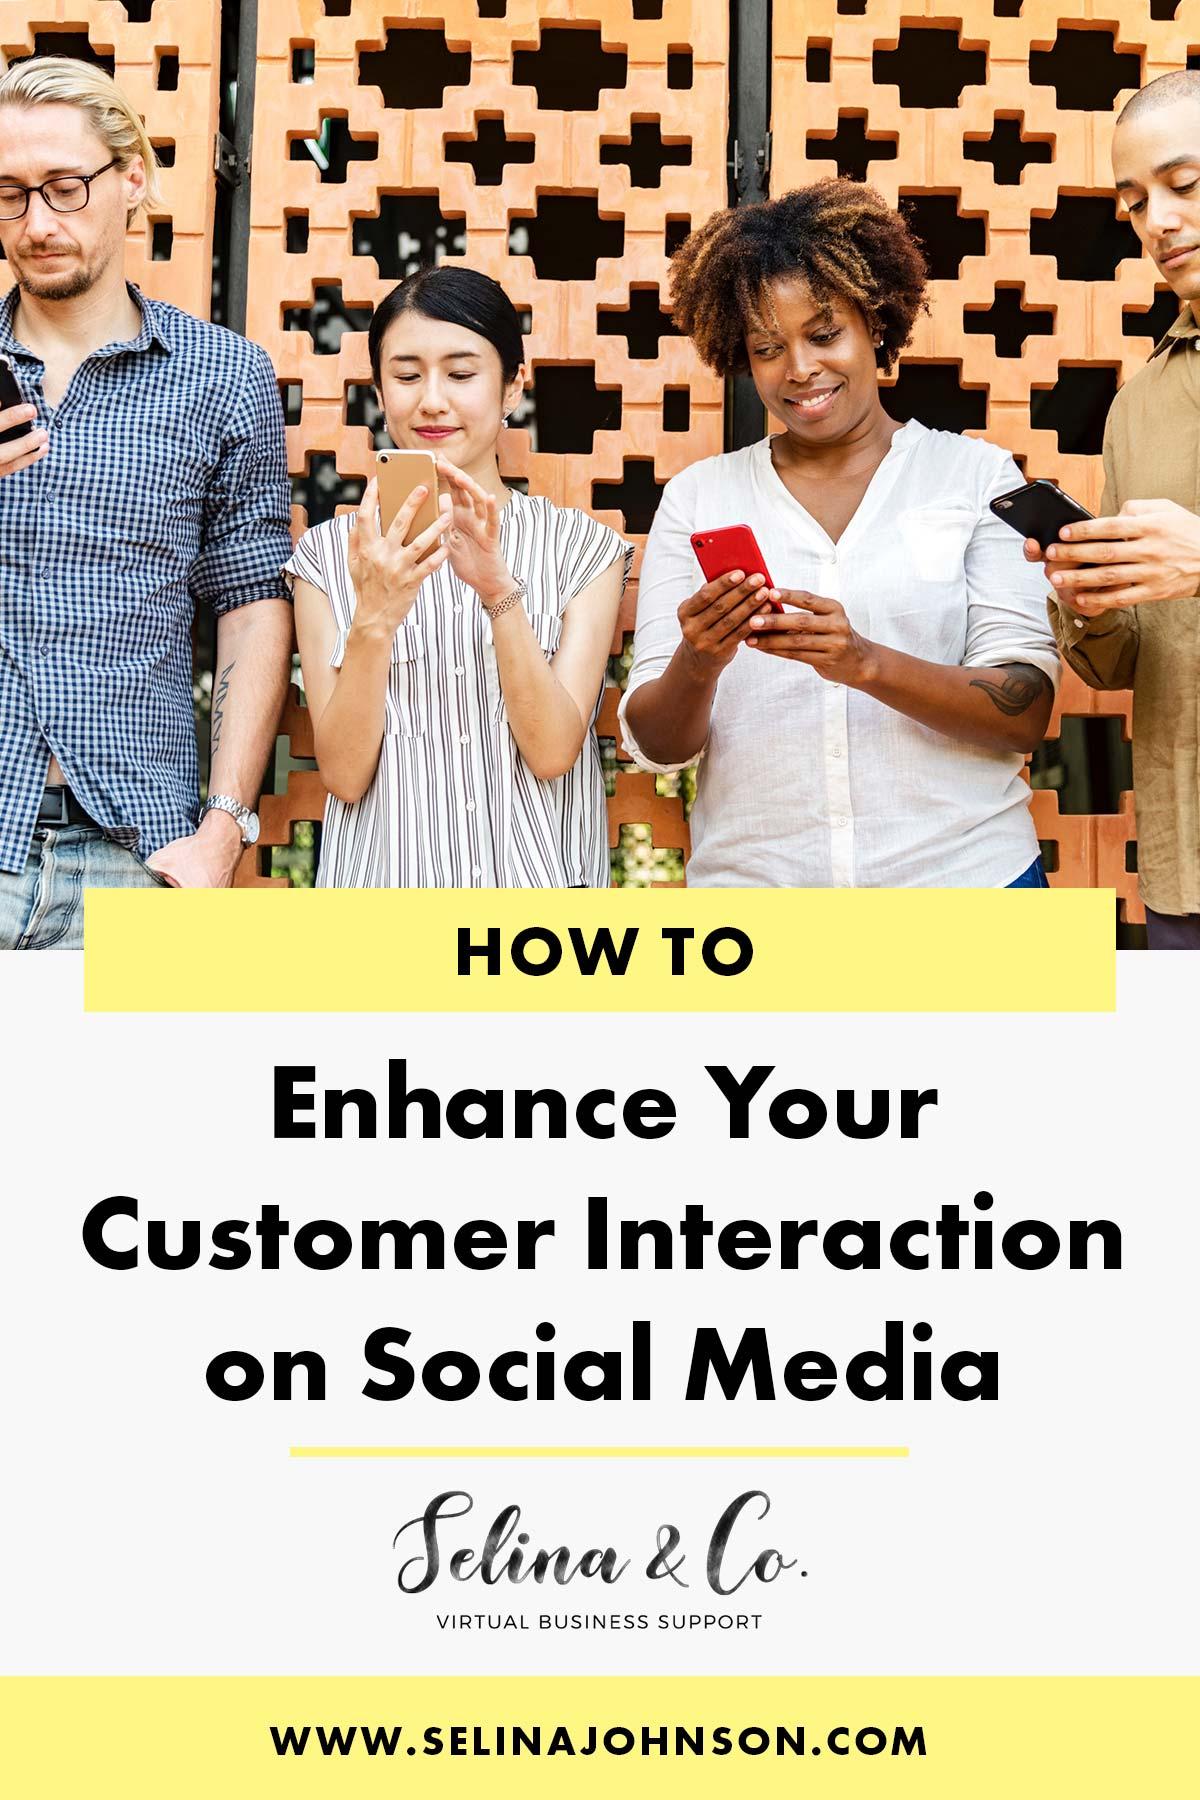 how-to-customer-interaction-social-media.jpg